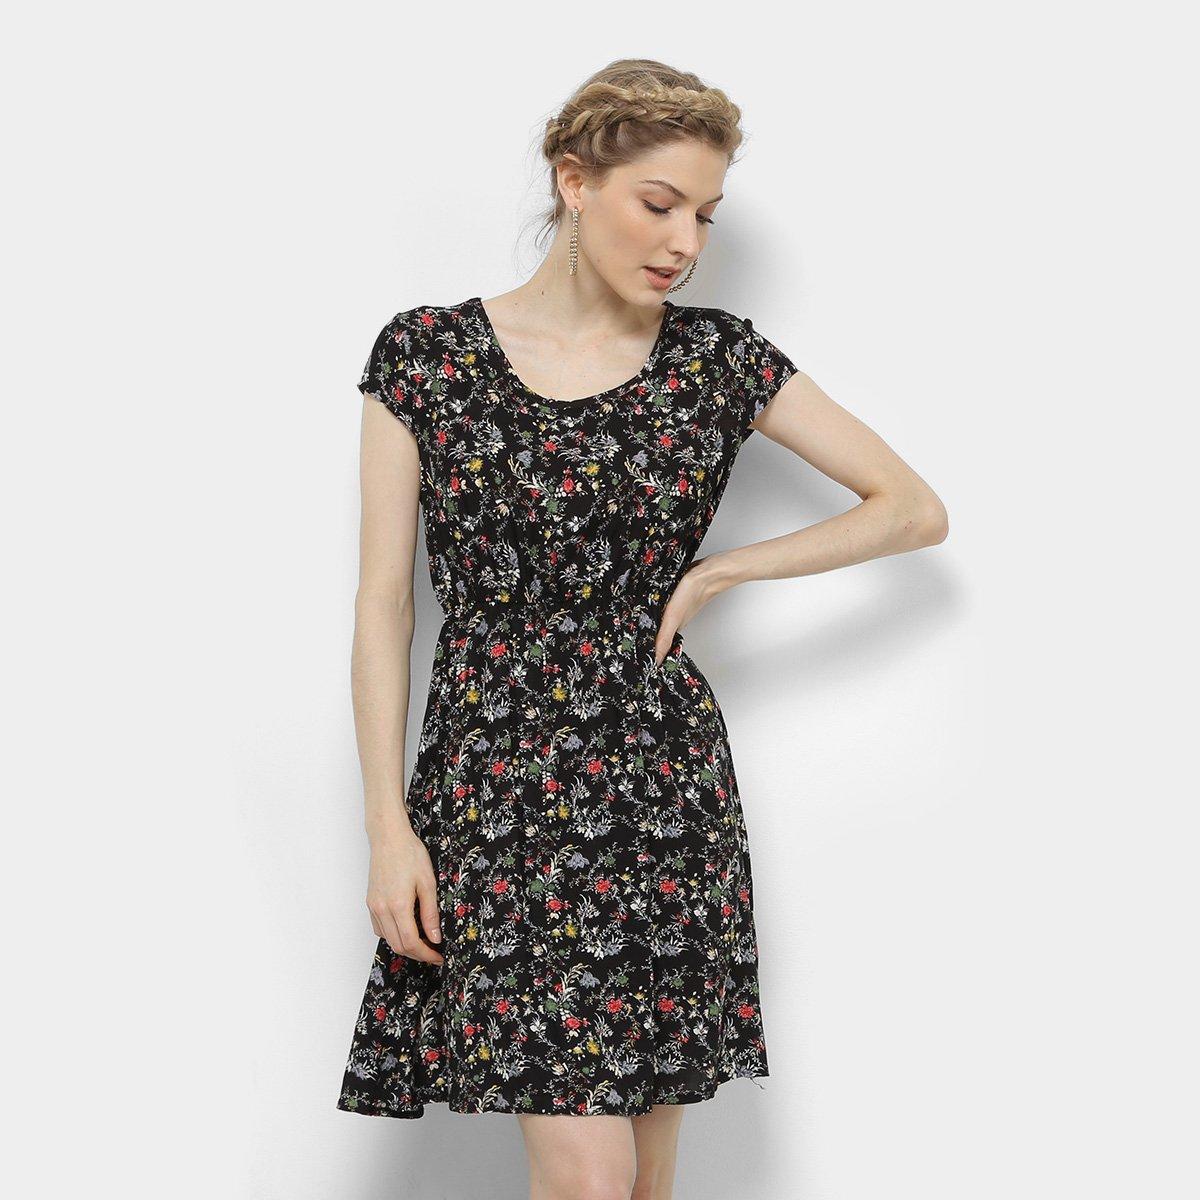 Vestido Estampado Pérola Feminino - Compre Agora  e9a0e6aebf3fb